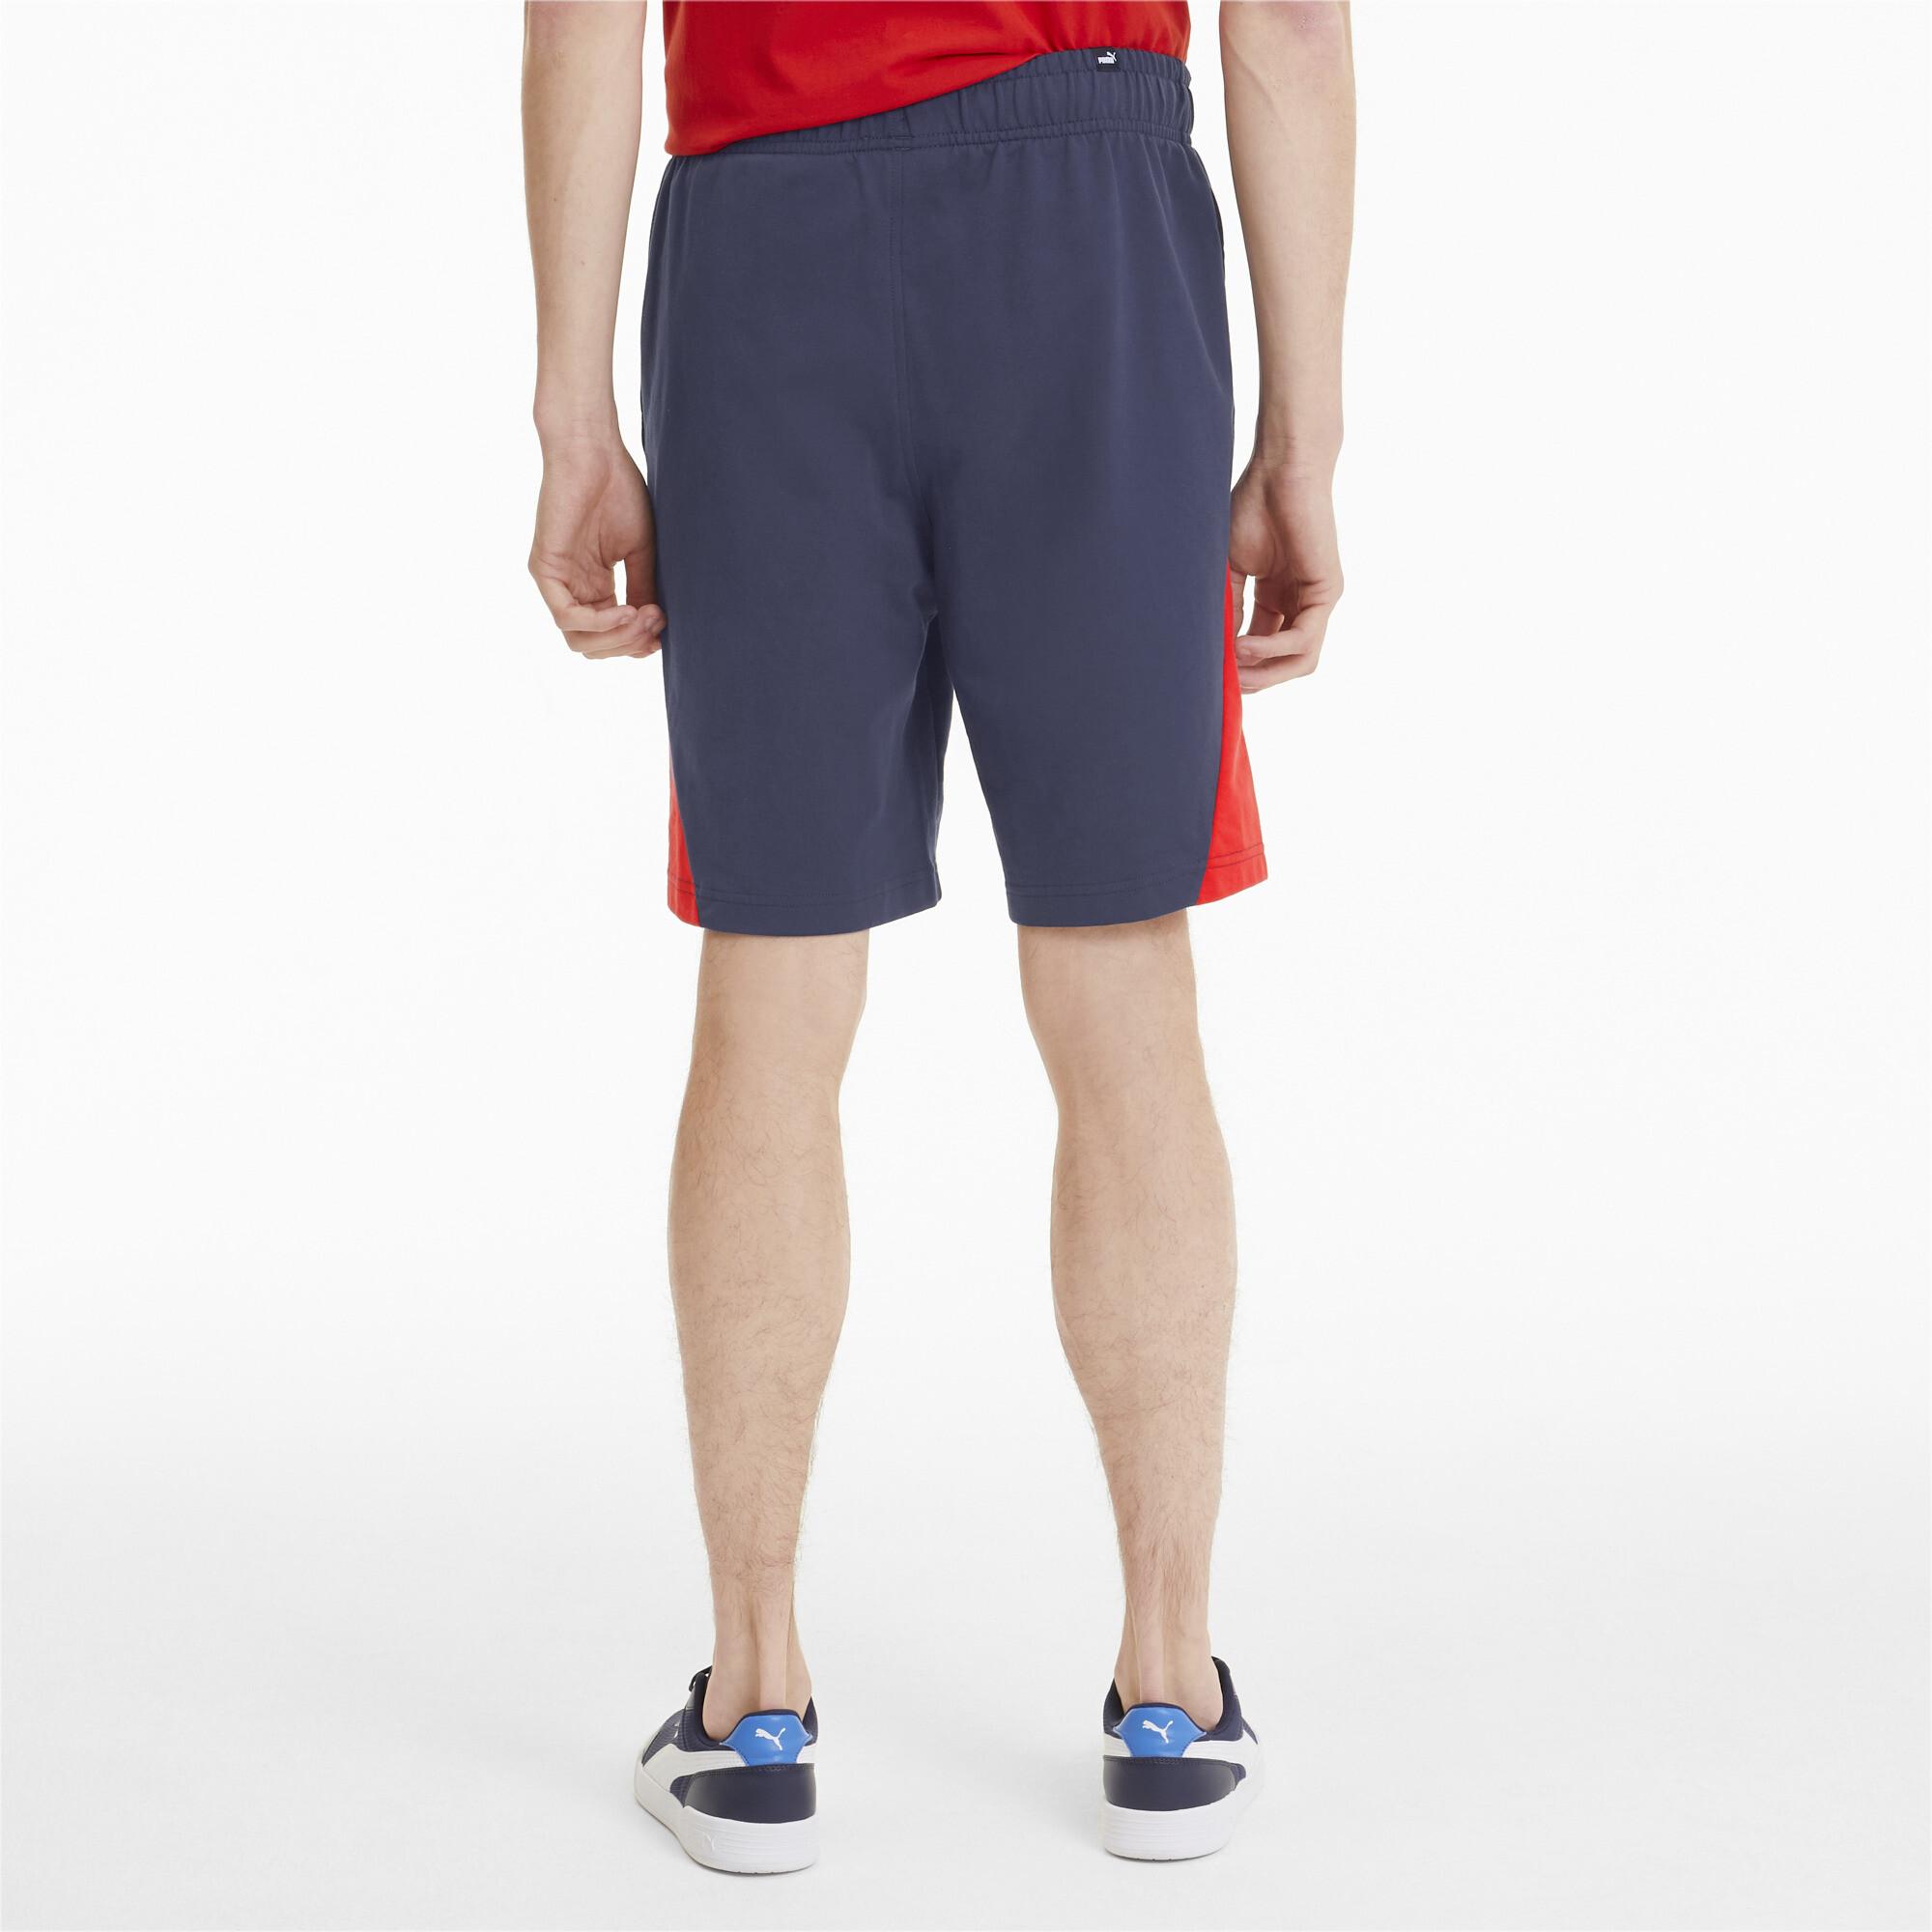 PUMA-Summer-Print-Men-039-s-Shorts-Men-Knitted-Shorts-Basics thumbnail 5